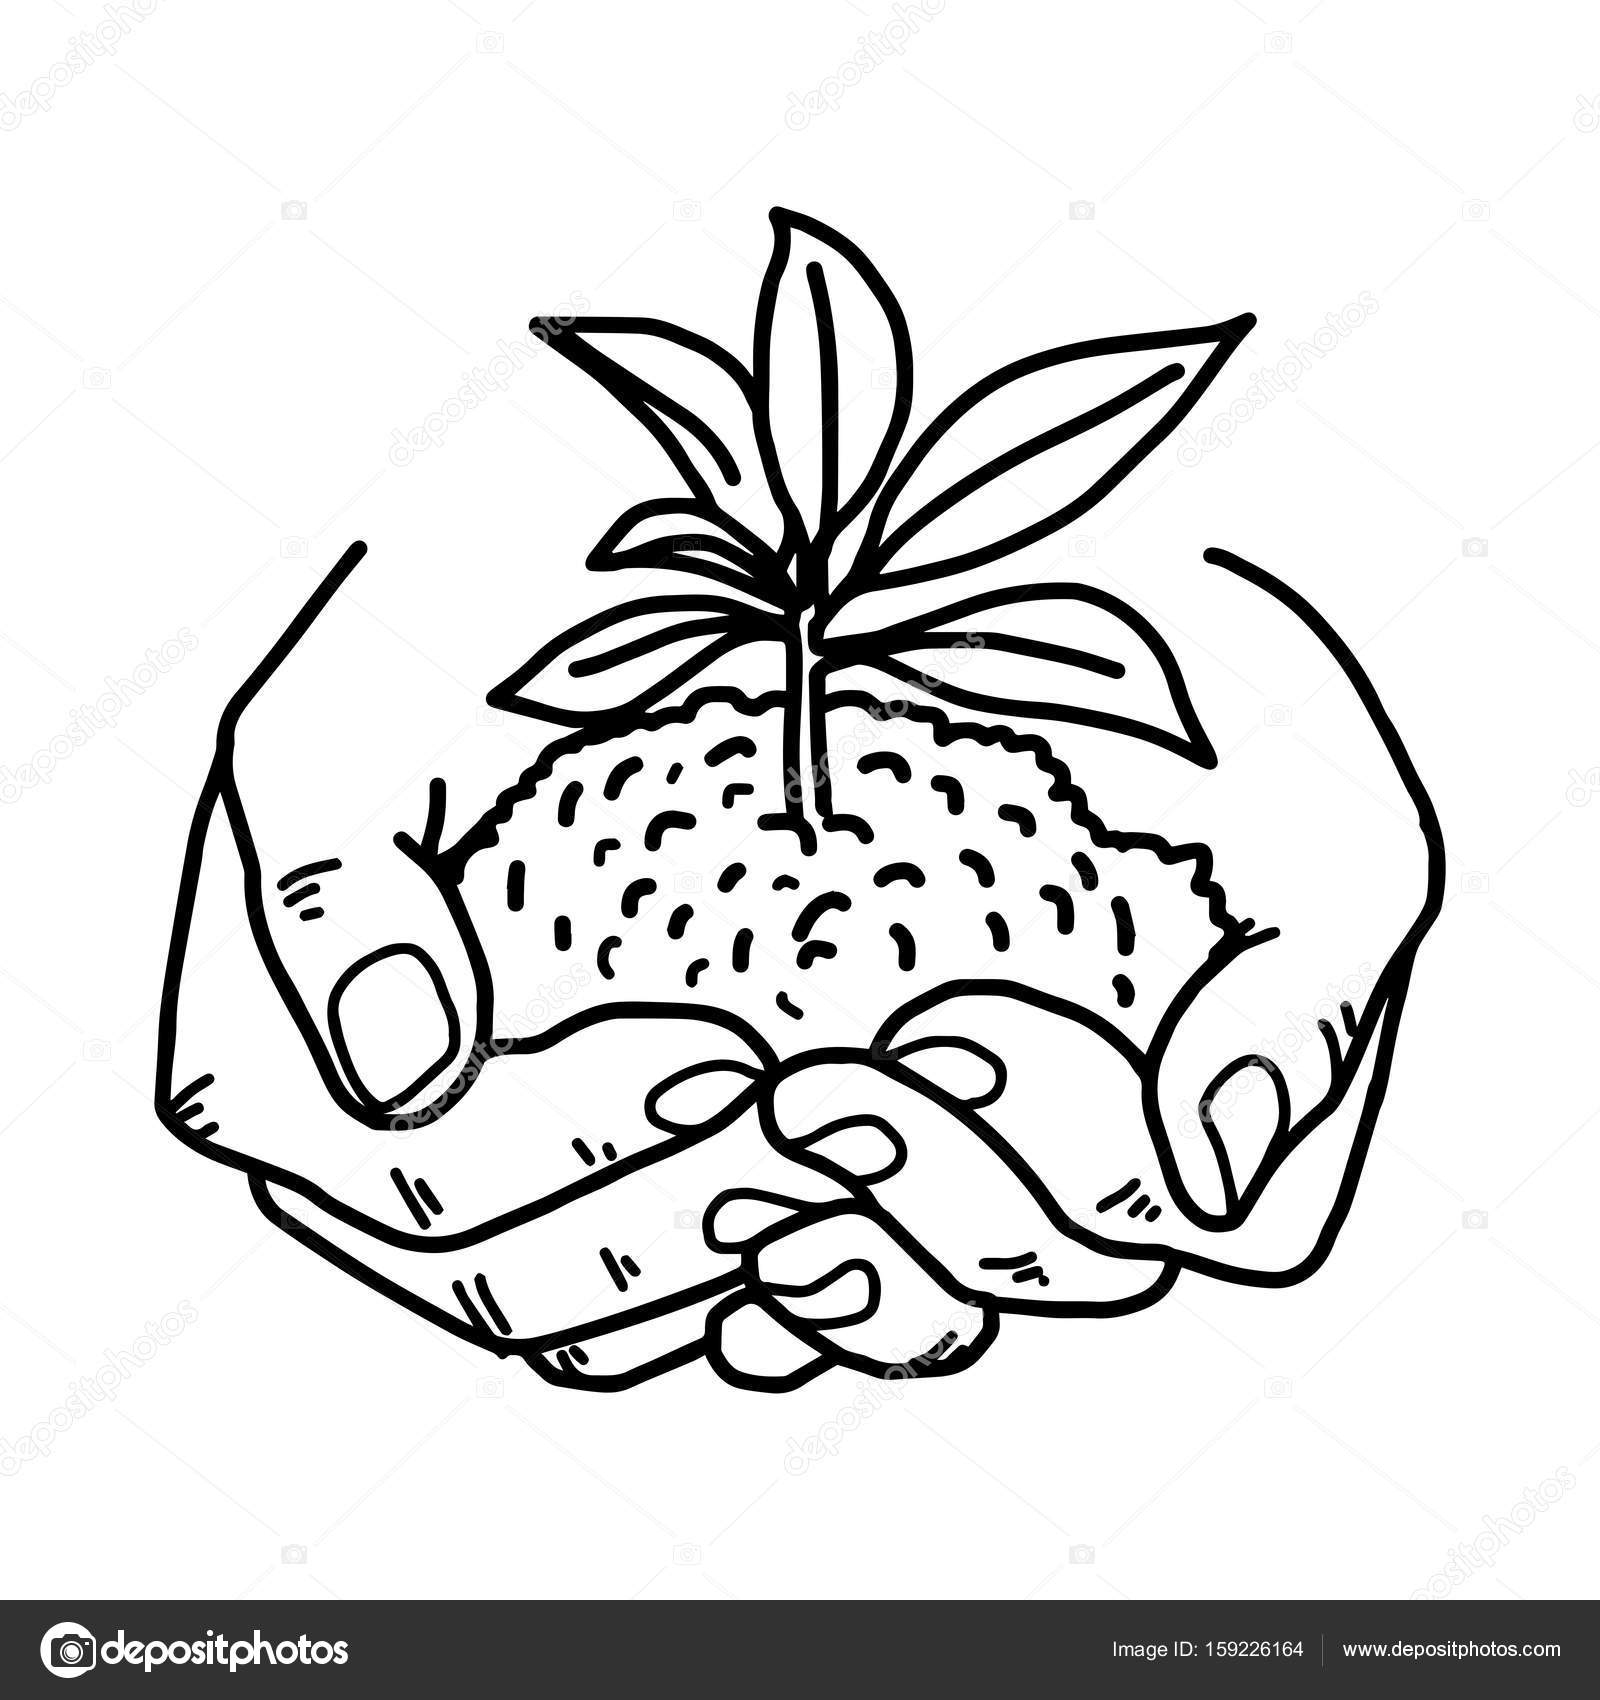 Growing Plant Drawing At Getdrawings